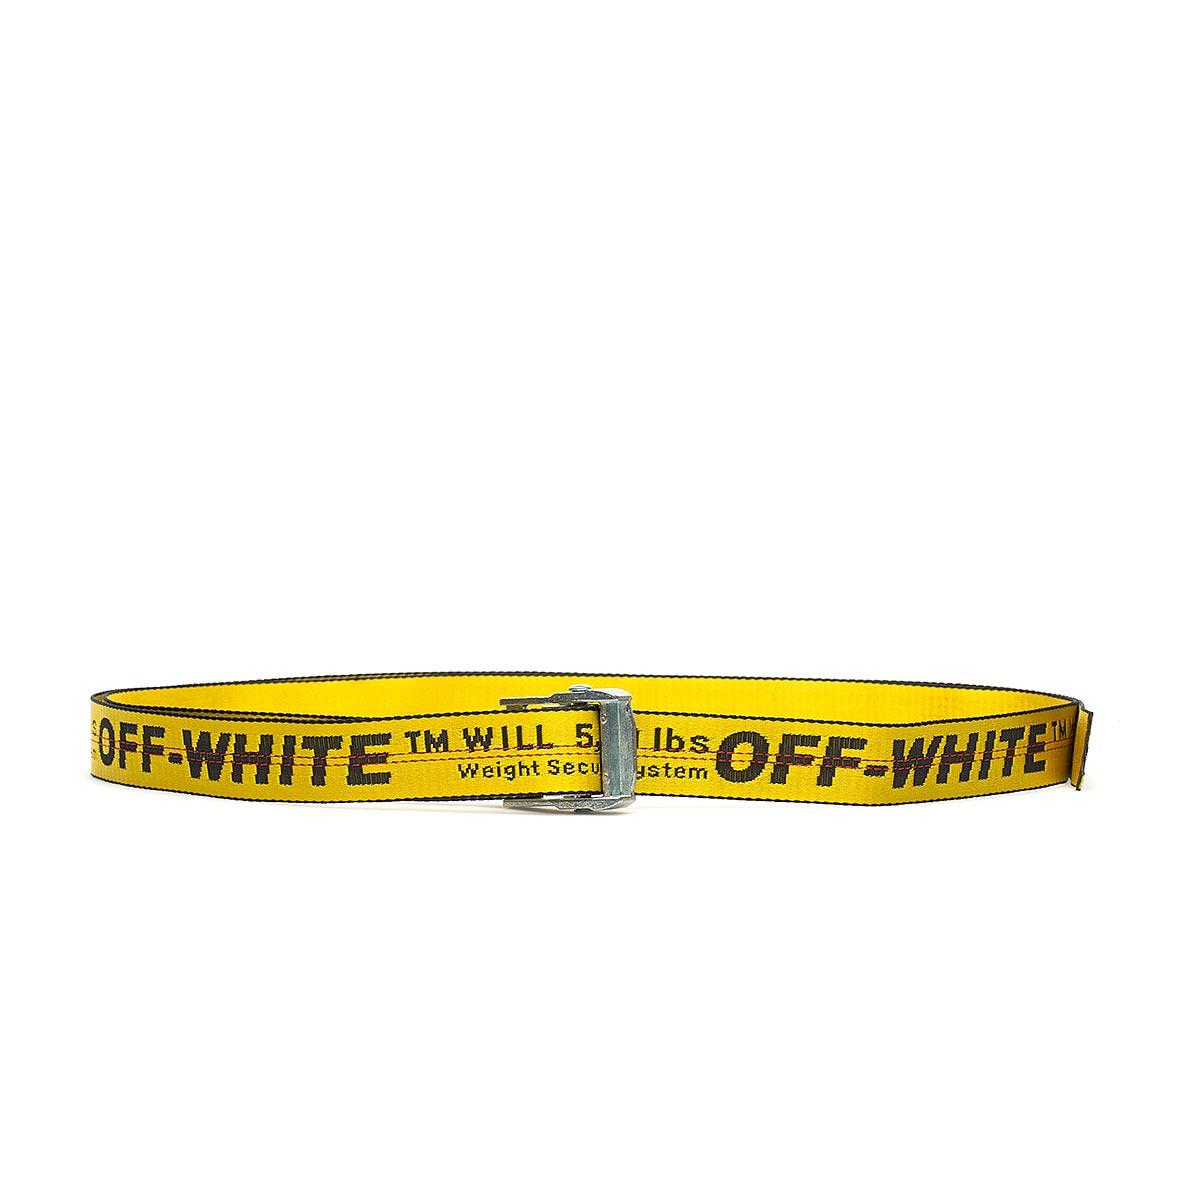 off white c o virgil abloh industrial belt in yellow for men lyst. Black Bedroom Furniture Sets. Home Design Ideas